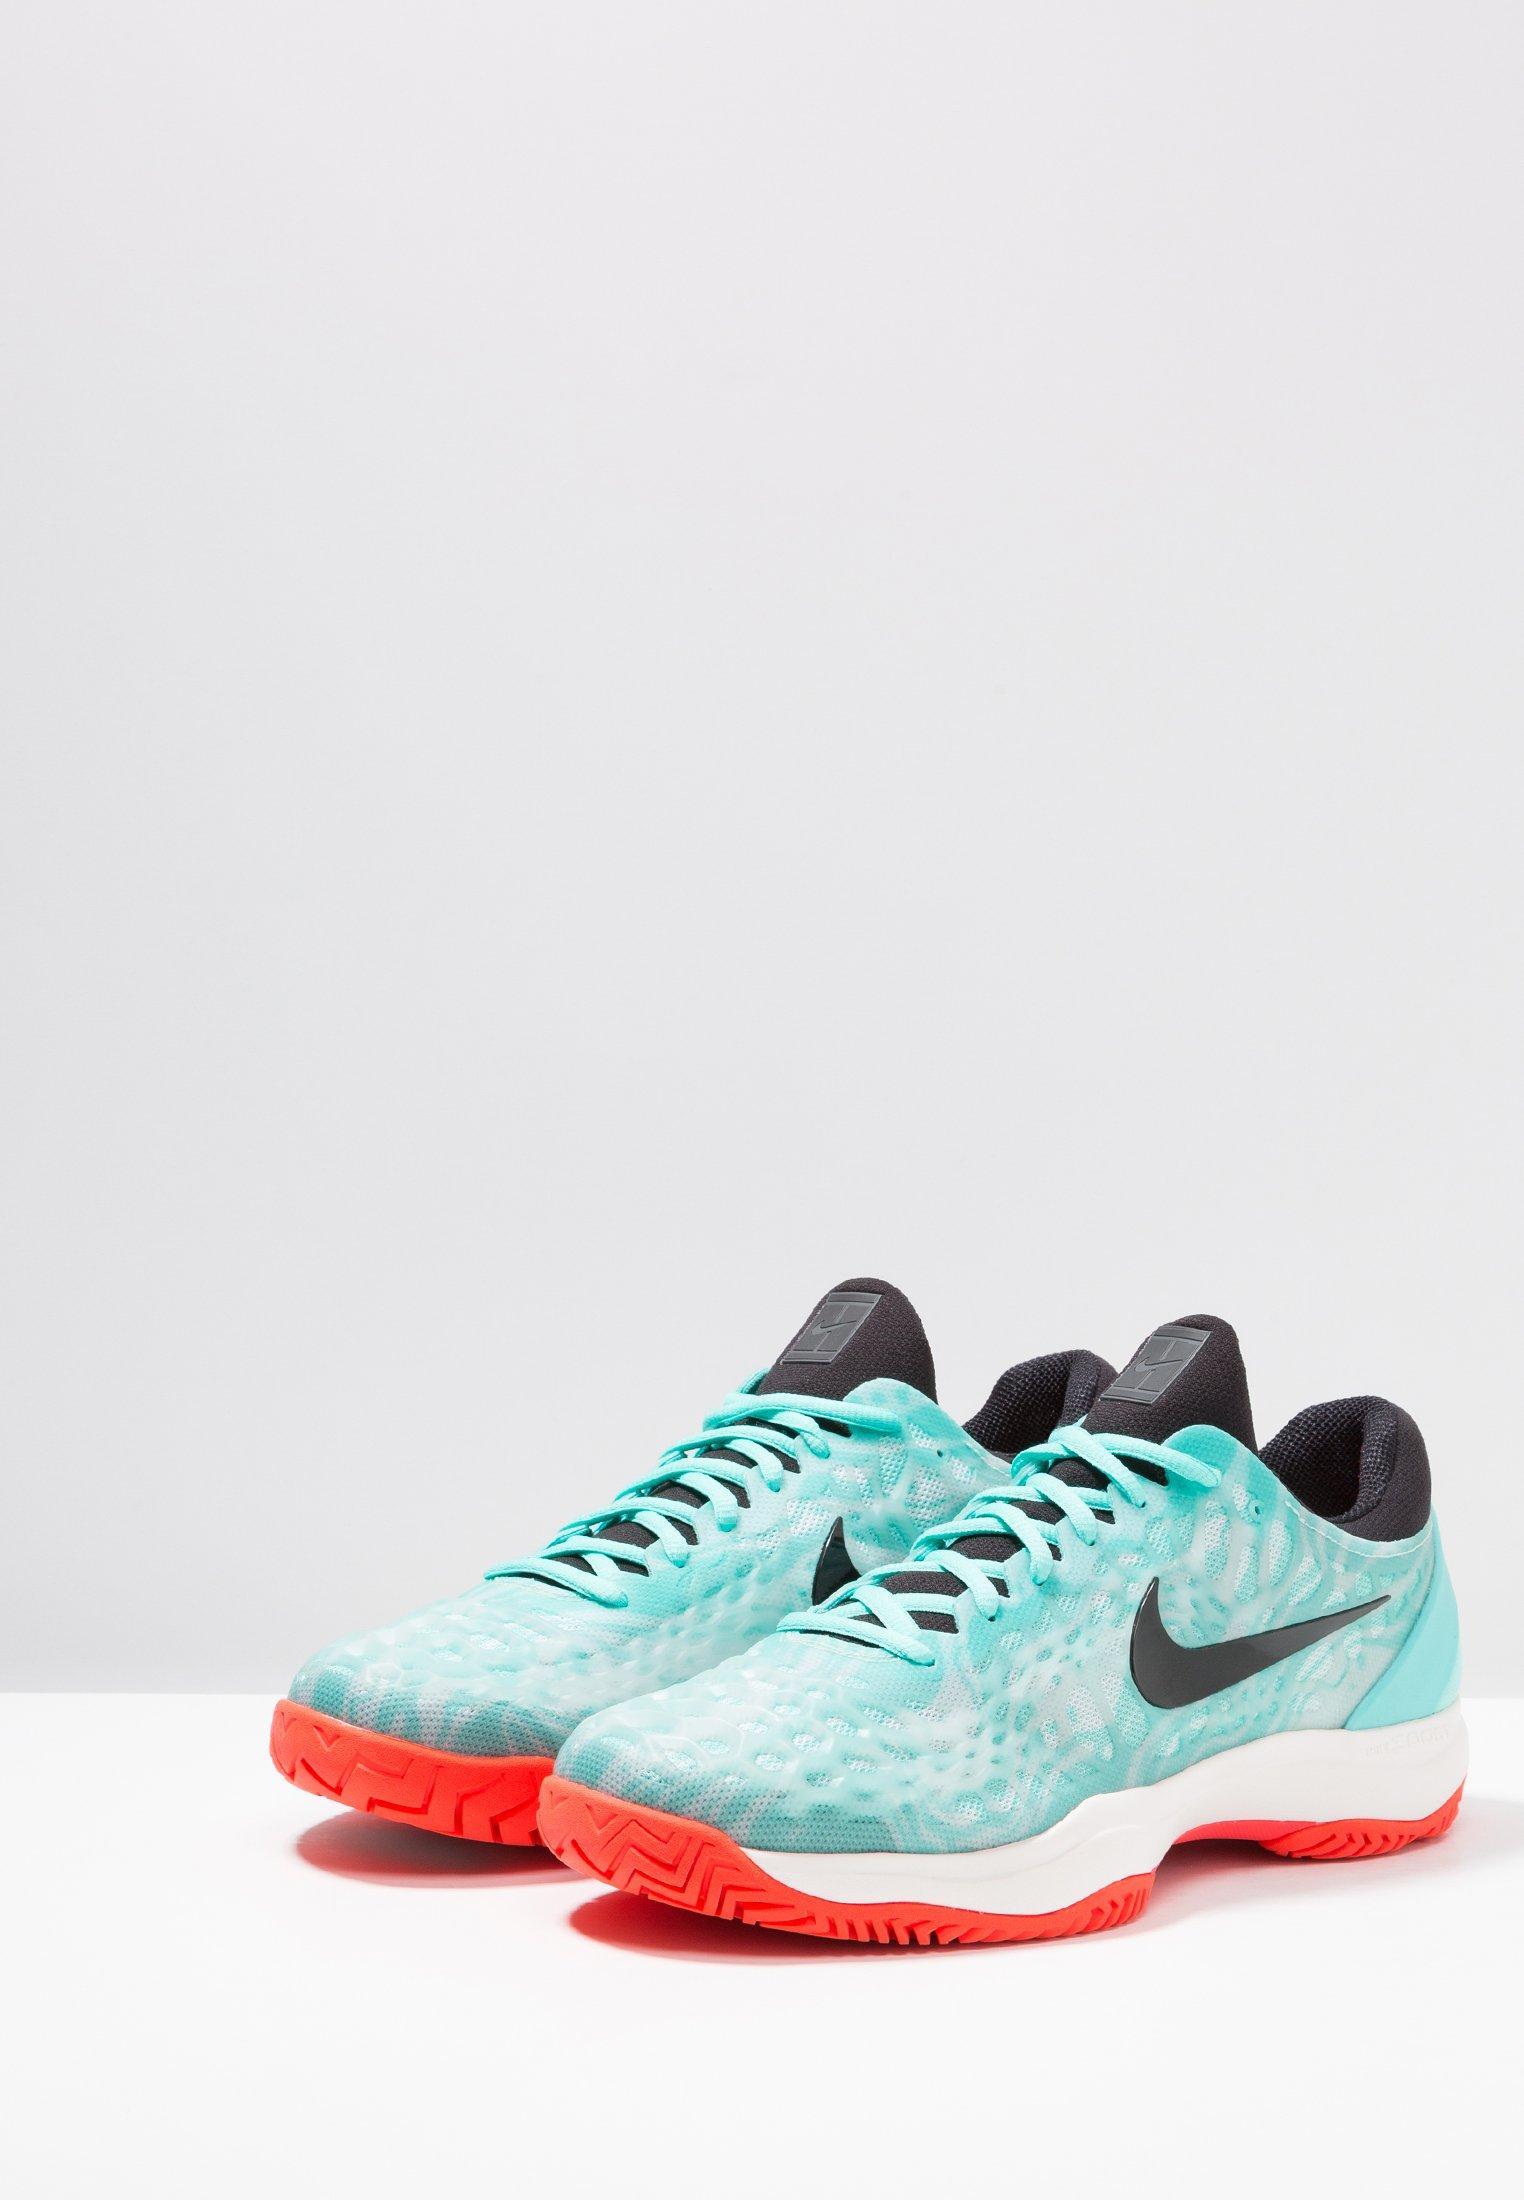 AIR ZOOM CAGE Chaussures de tennis pour terre battueerre battue aurora greenblackteal tintphantombright crimson